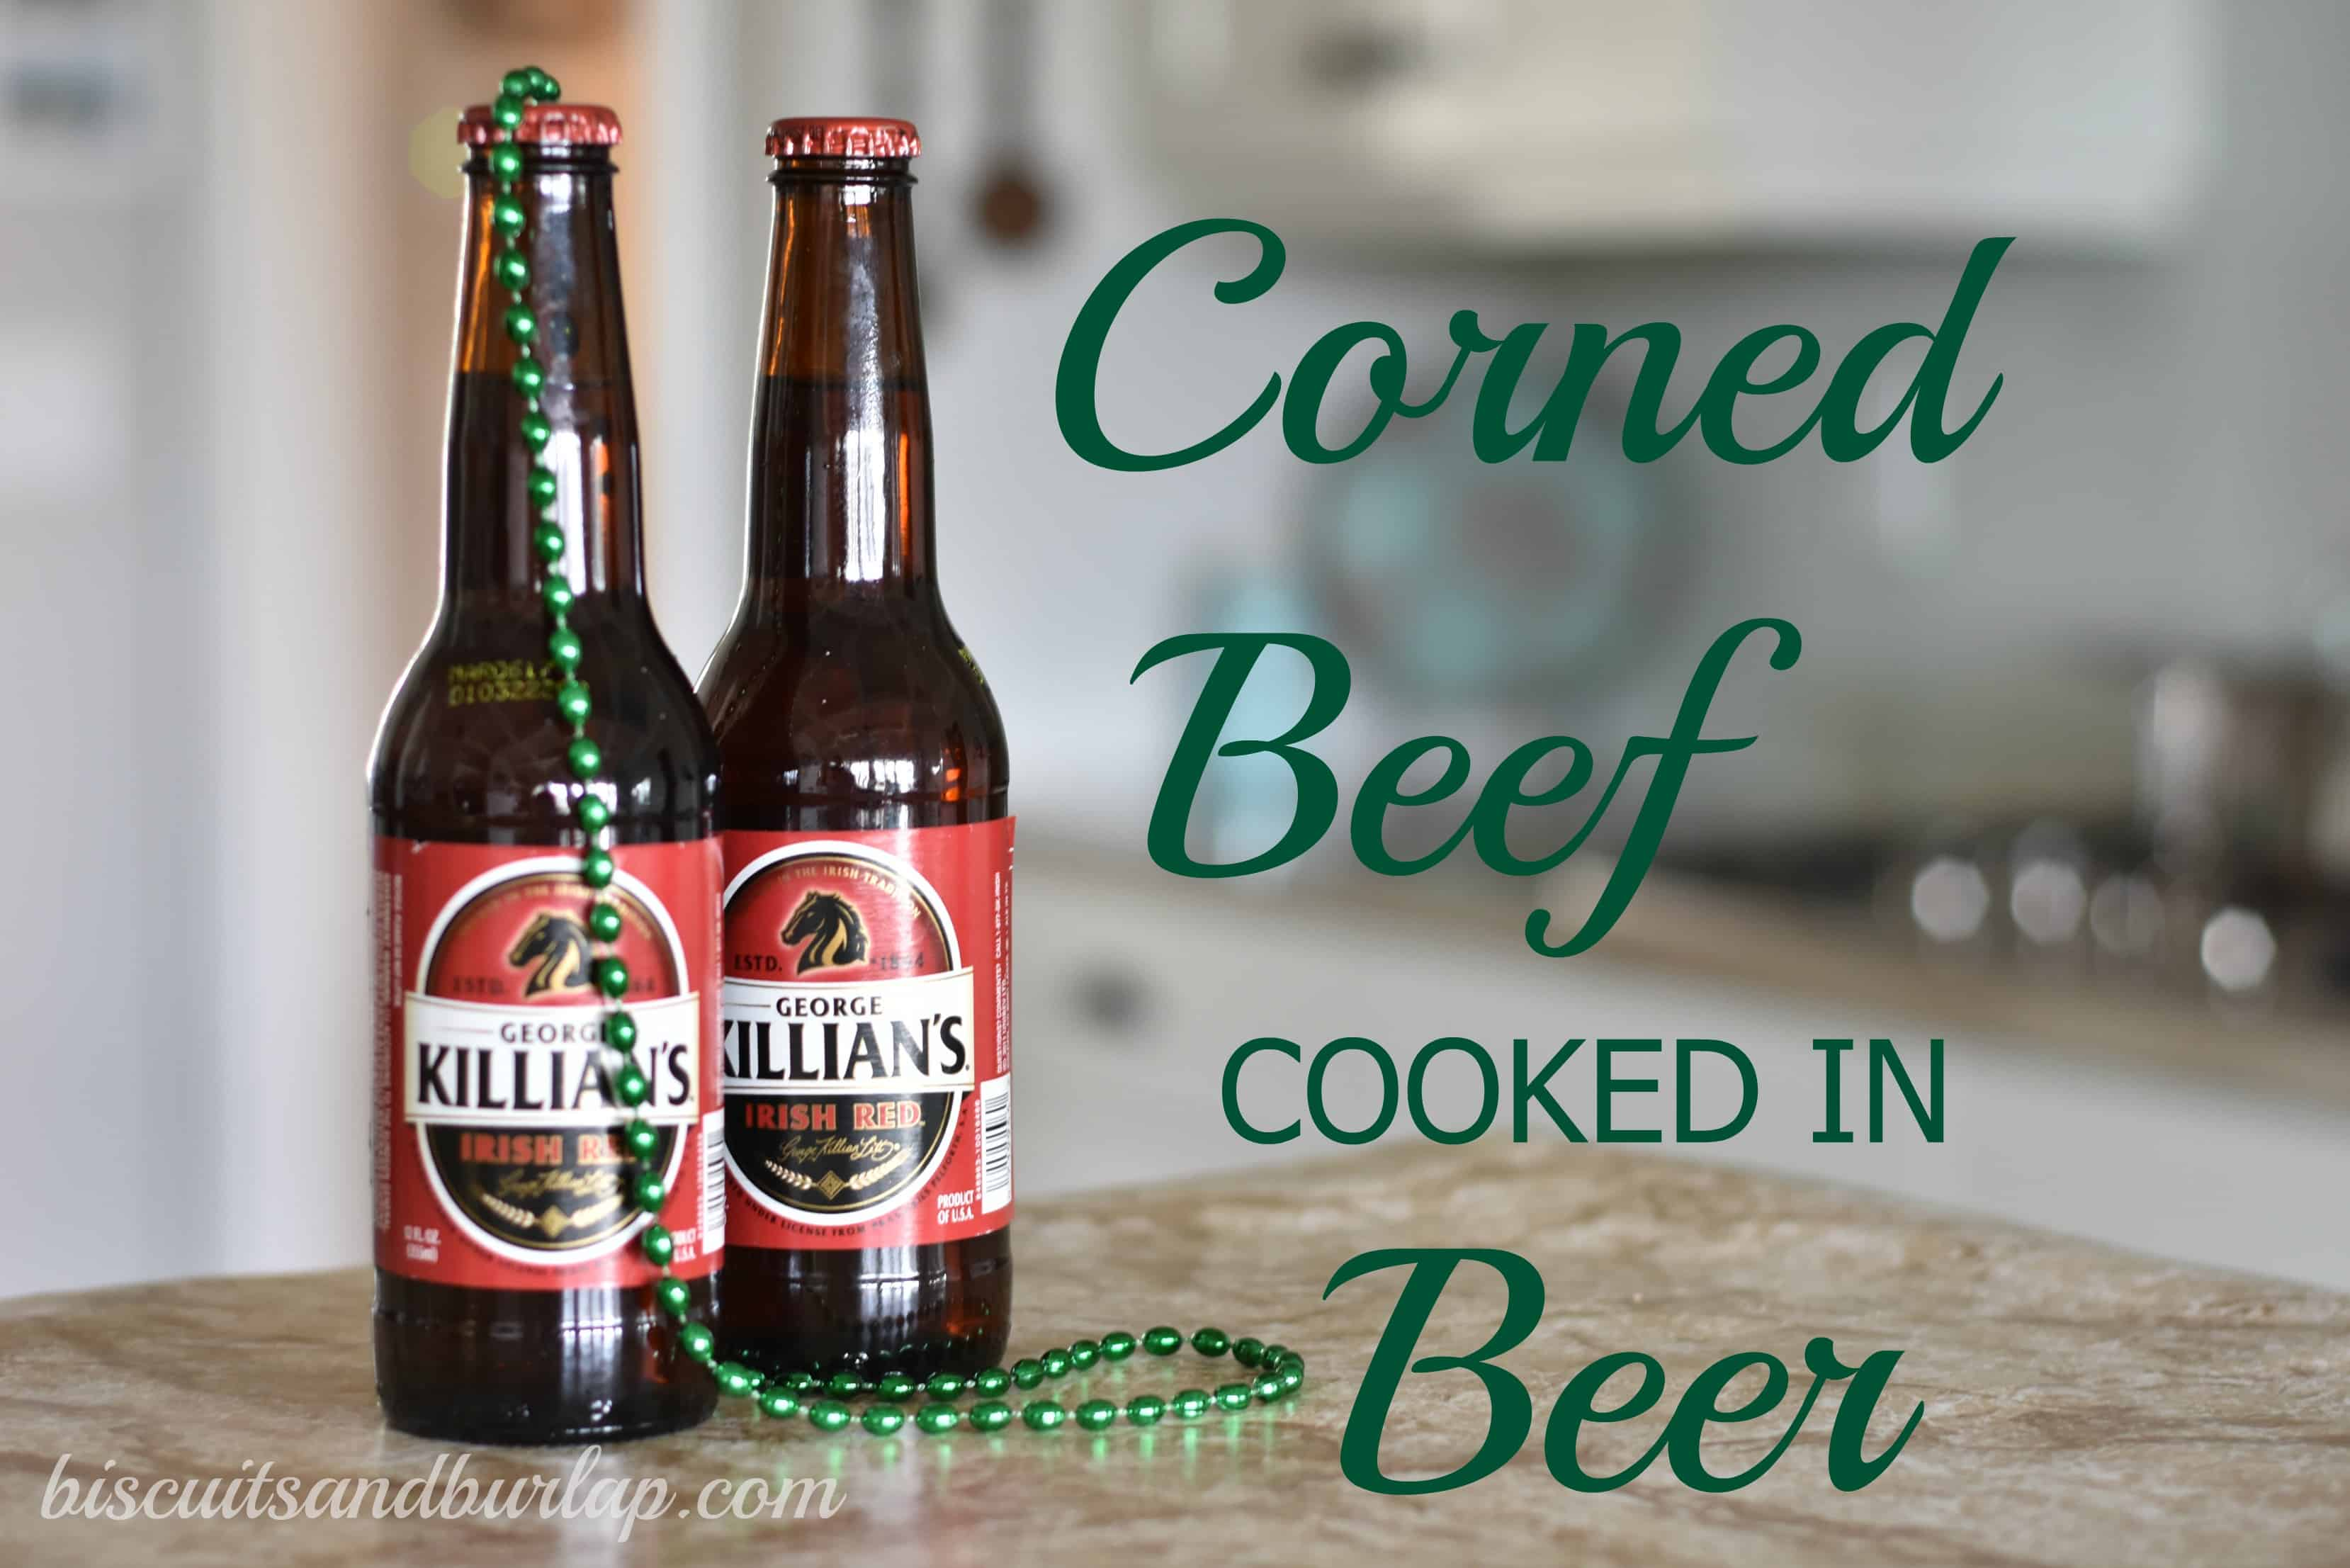 Corned Beef Cooked in Beer? You Bet!